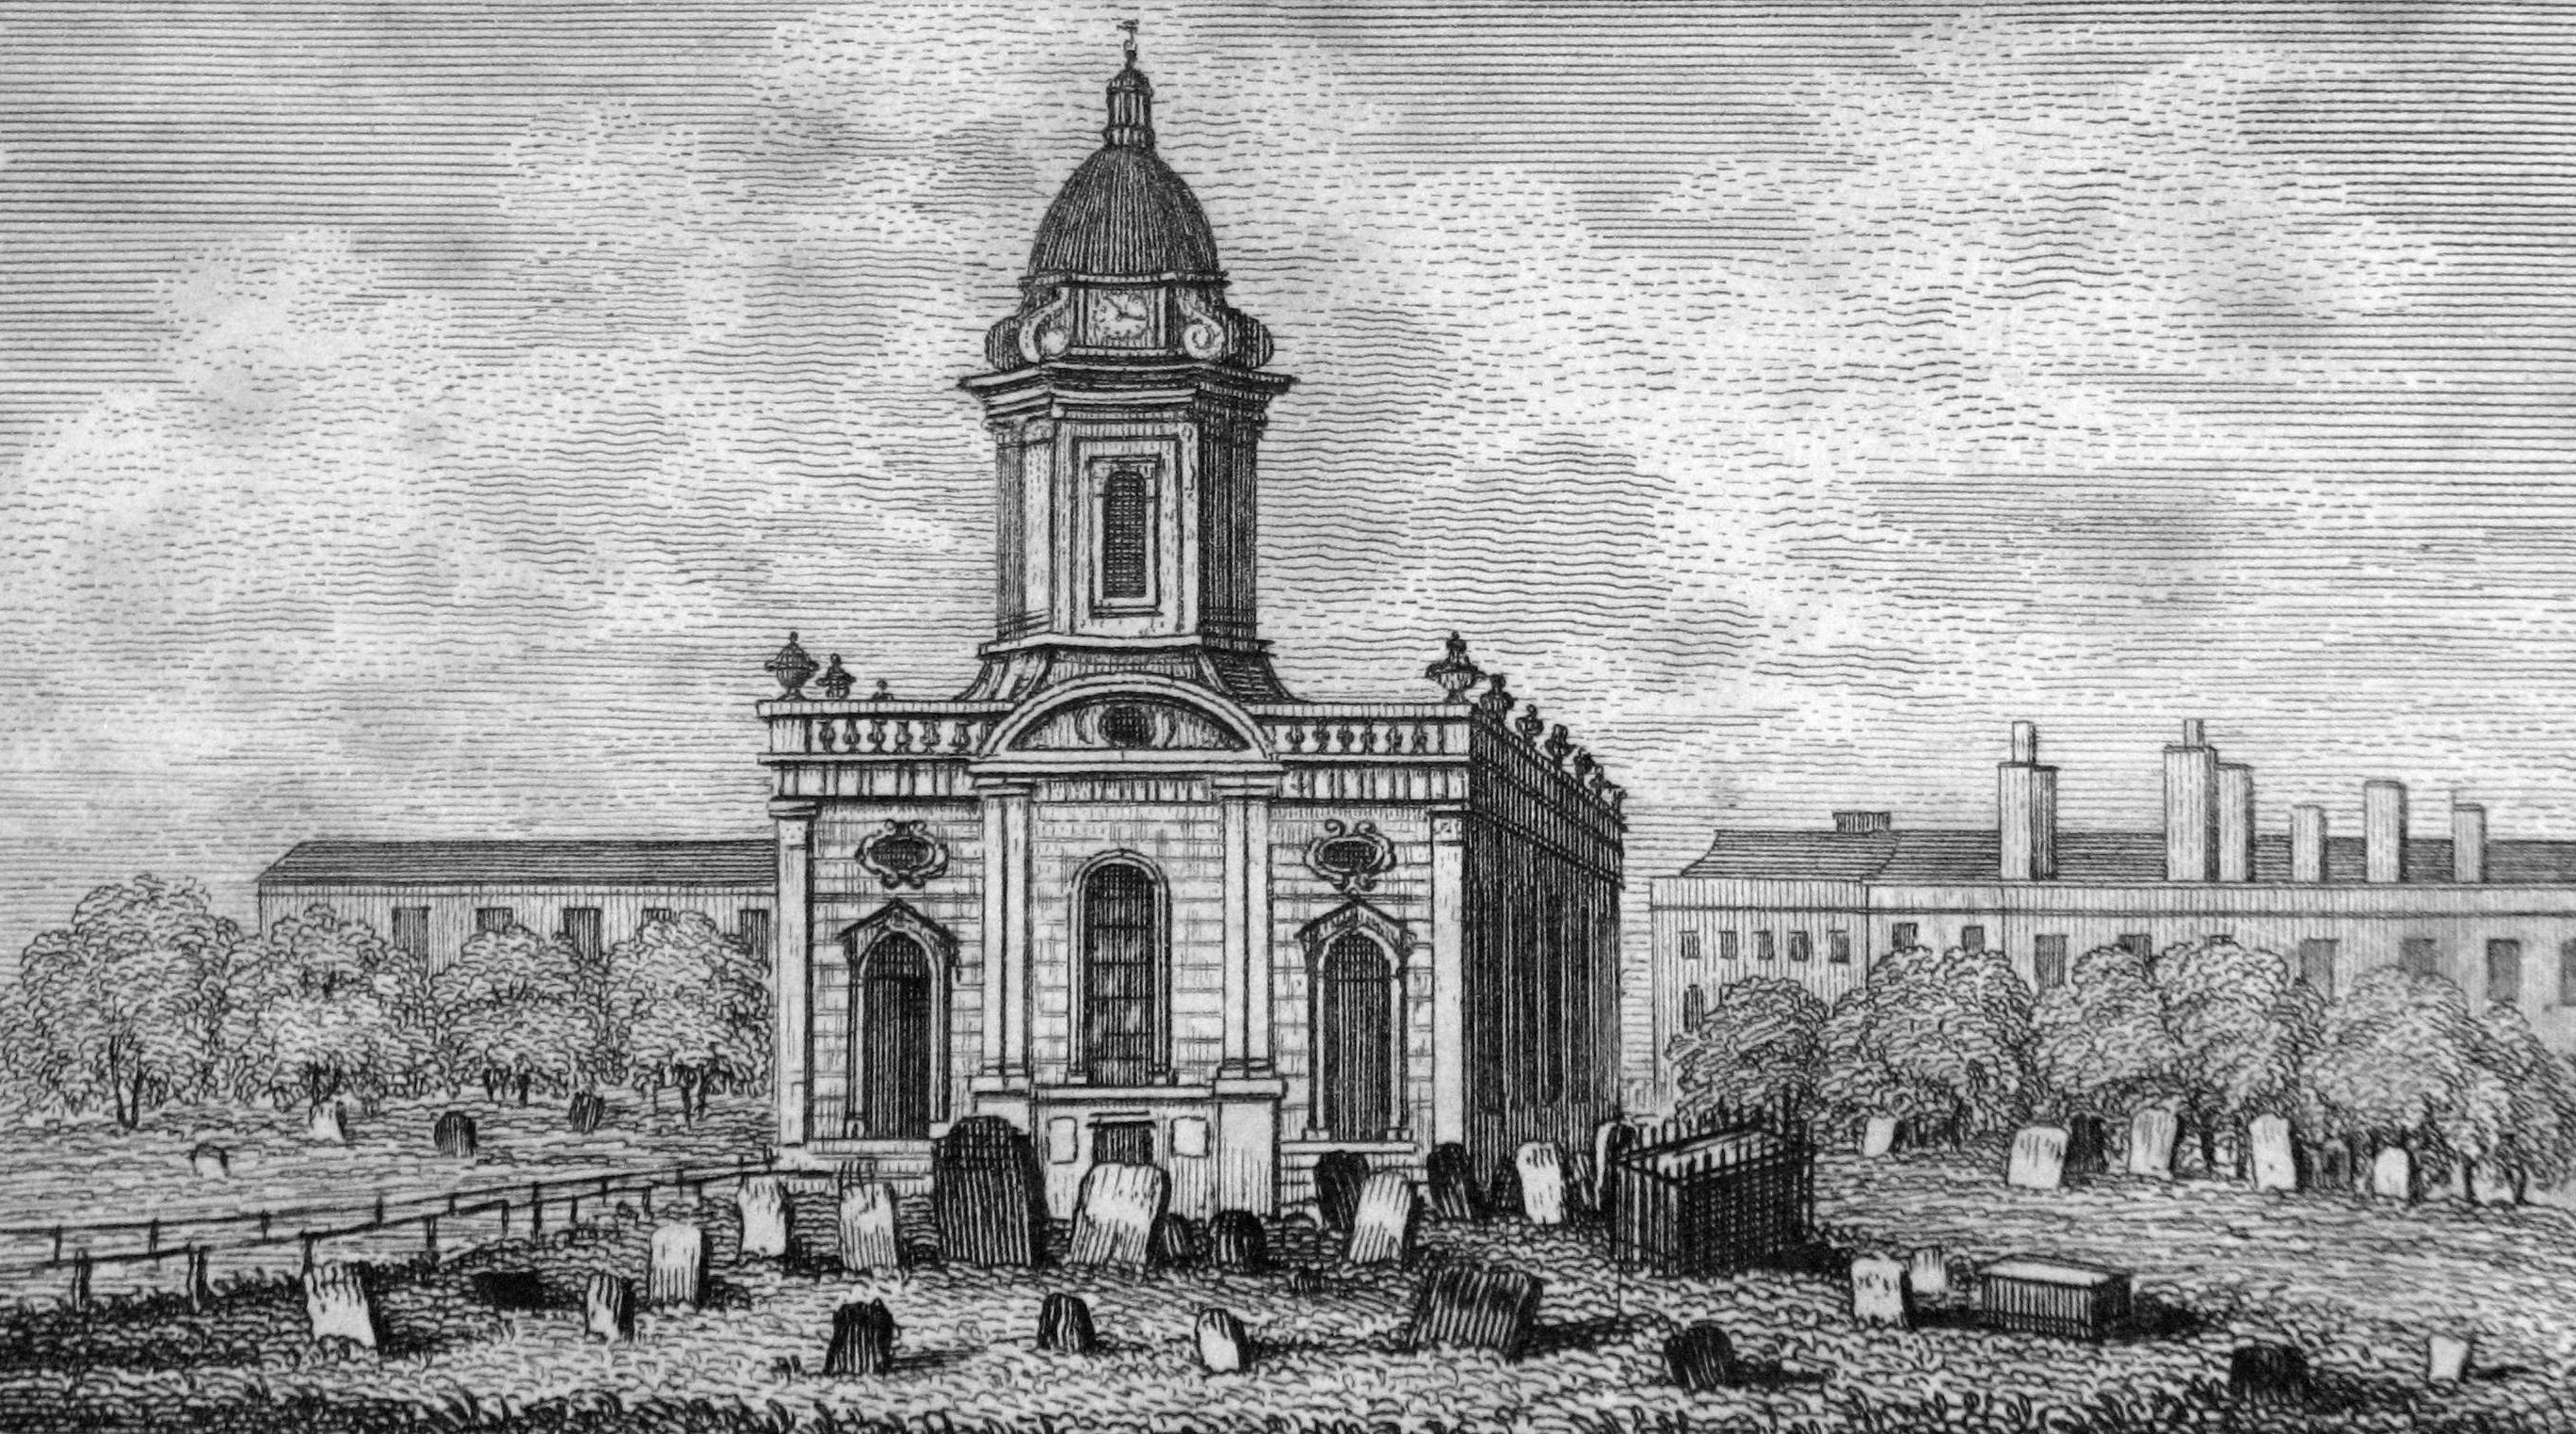 Fig 6 - St Philips Church